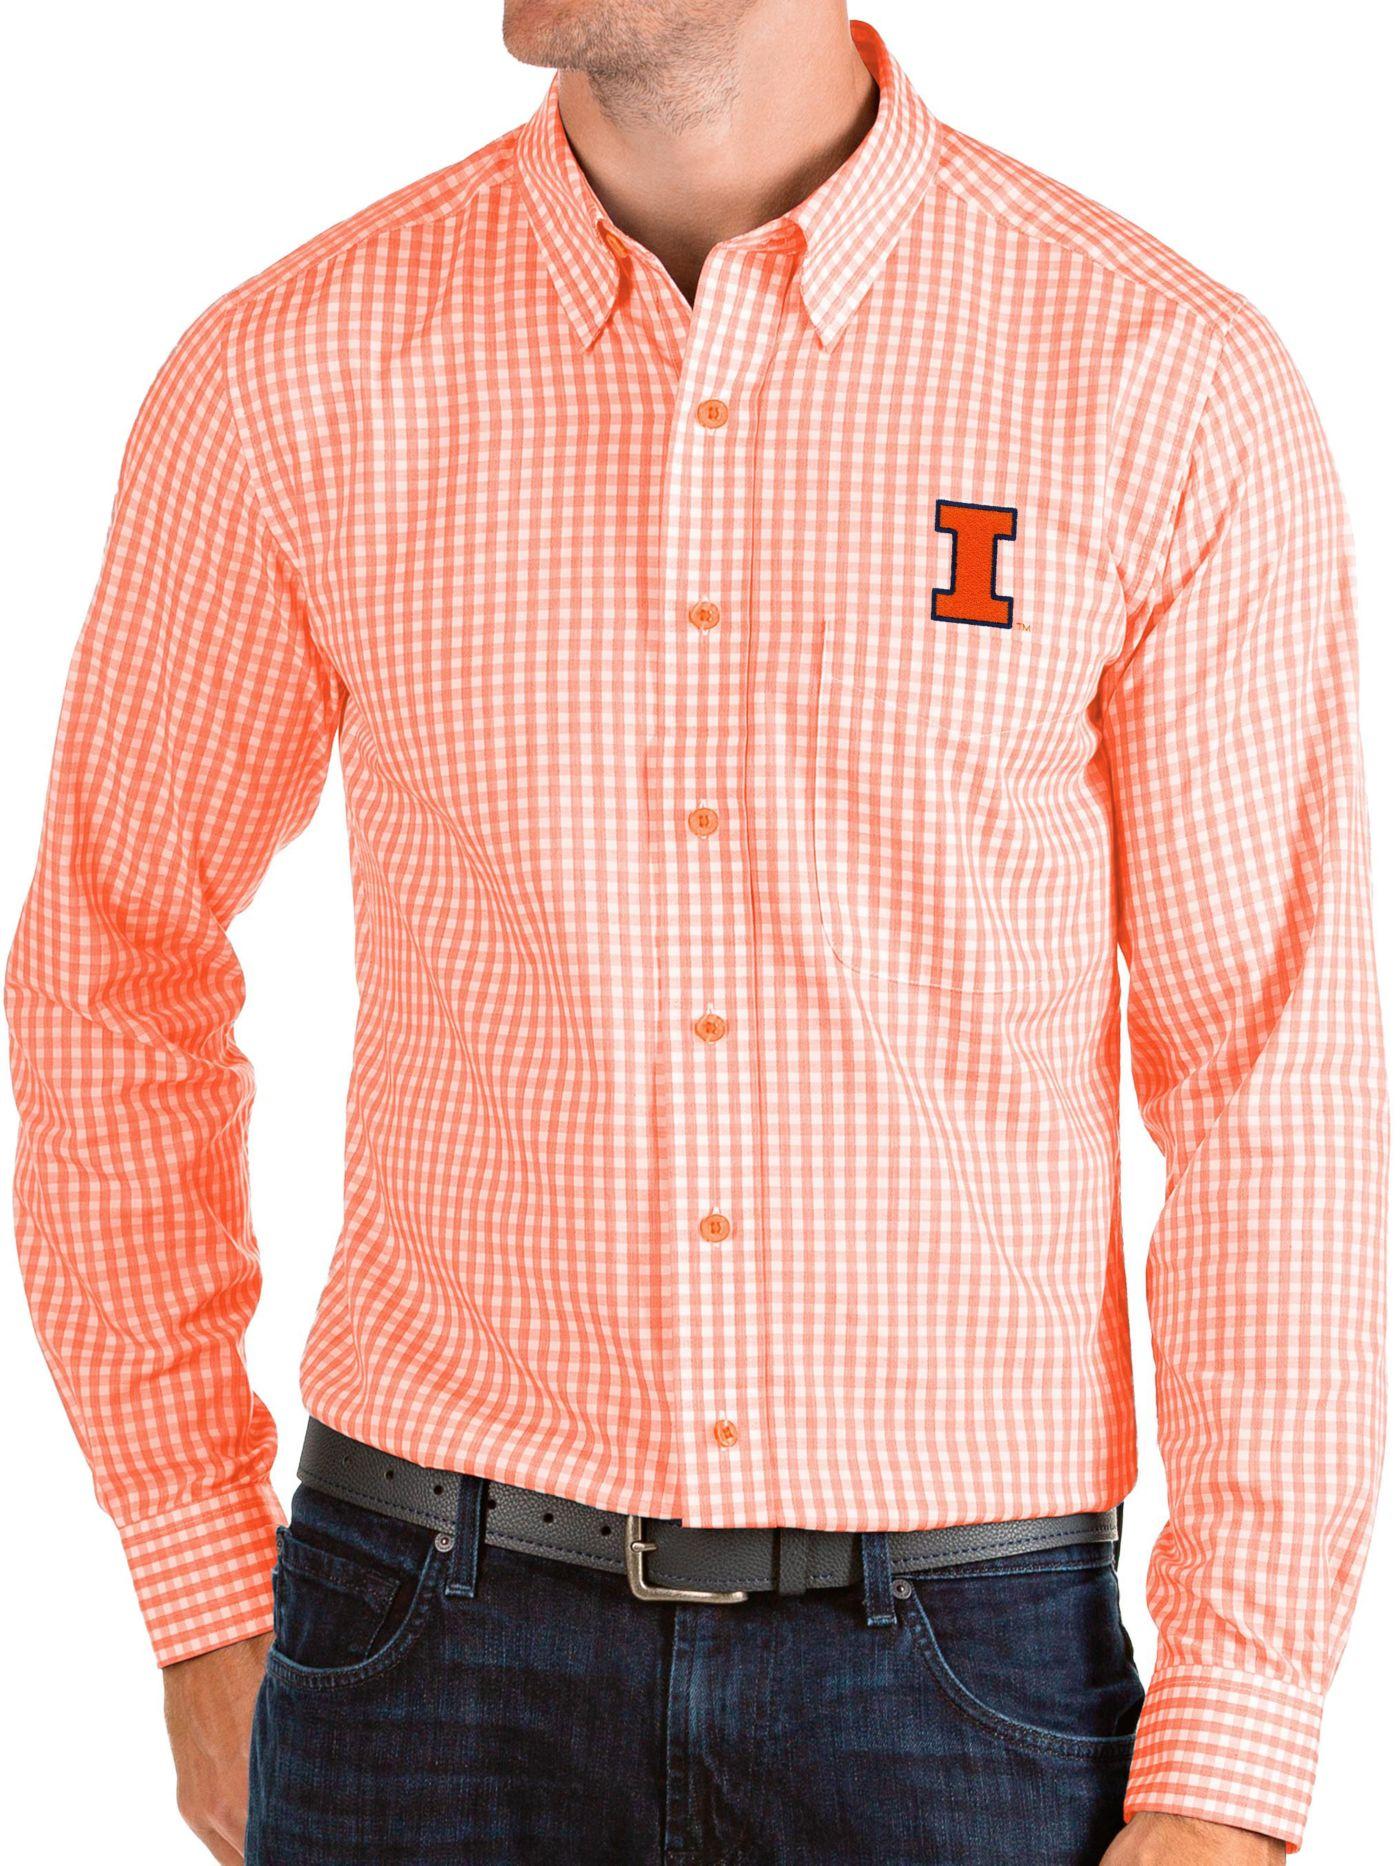 Antigua Men's Illinois Fighting Illini Orange Structure Button Down Long Sleeve Shirt